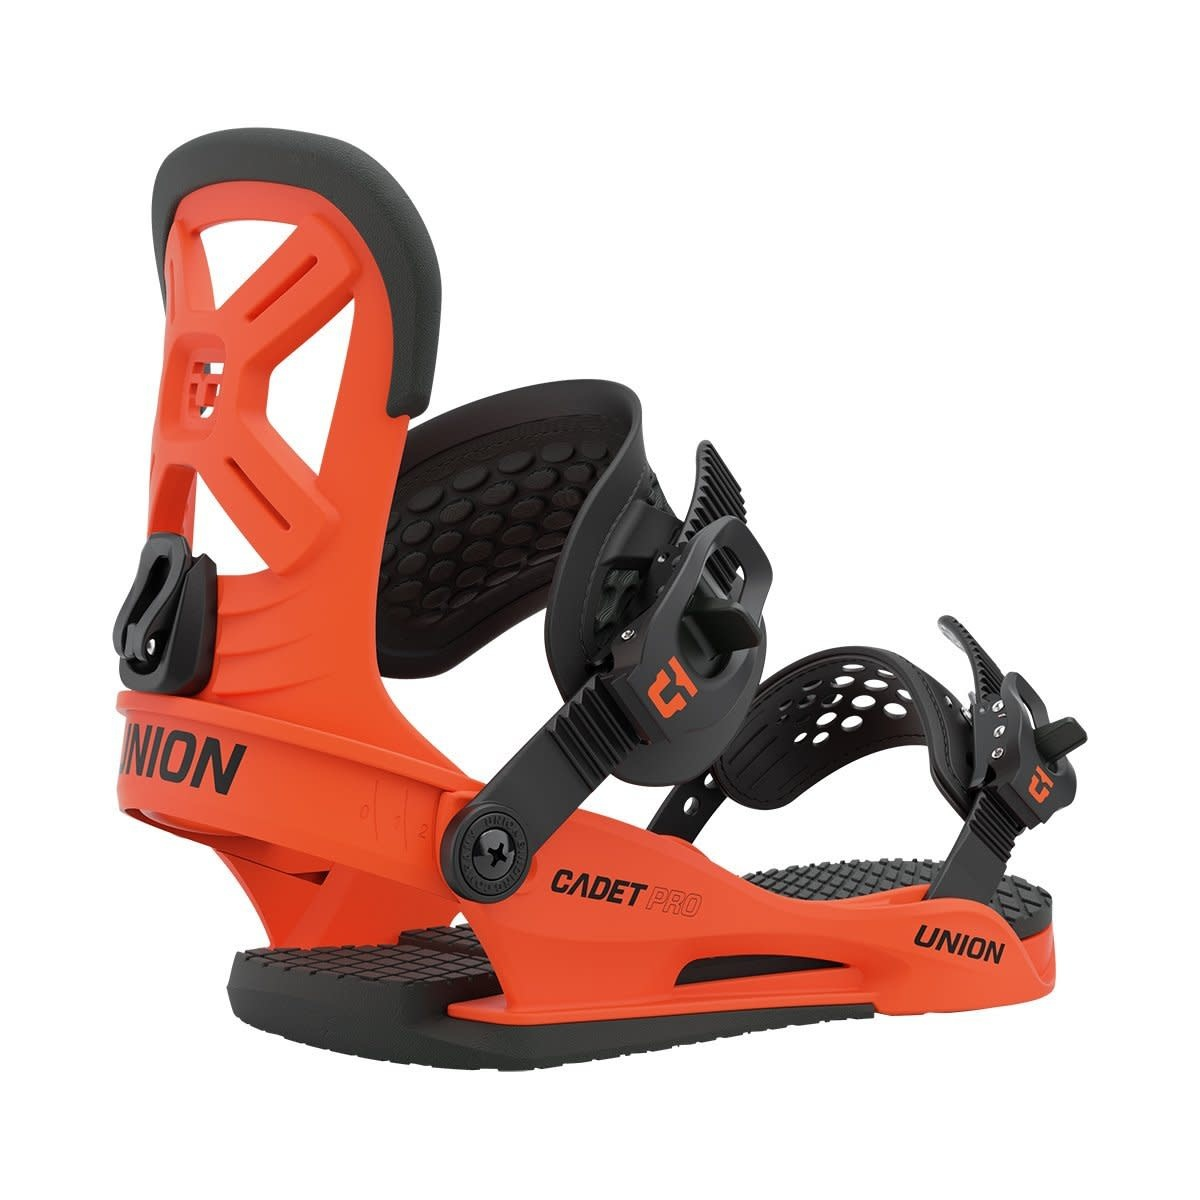 Union Union Youth Cadet Pro Snowboard Binding (2021)